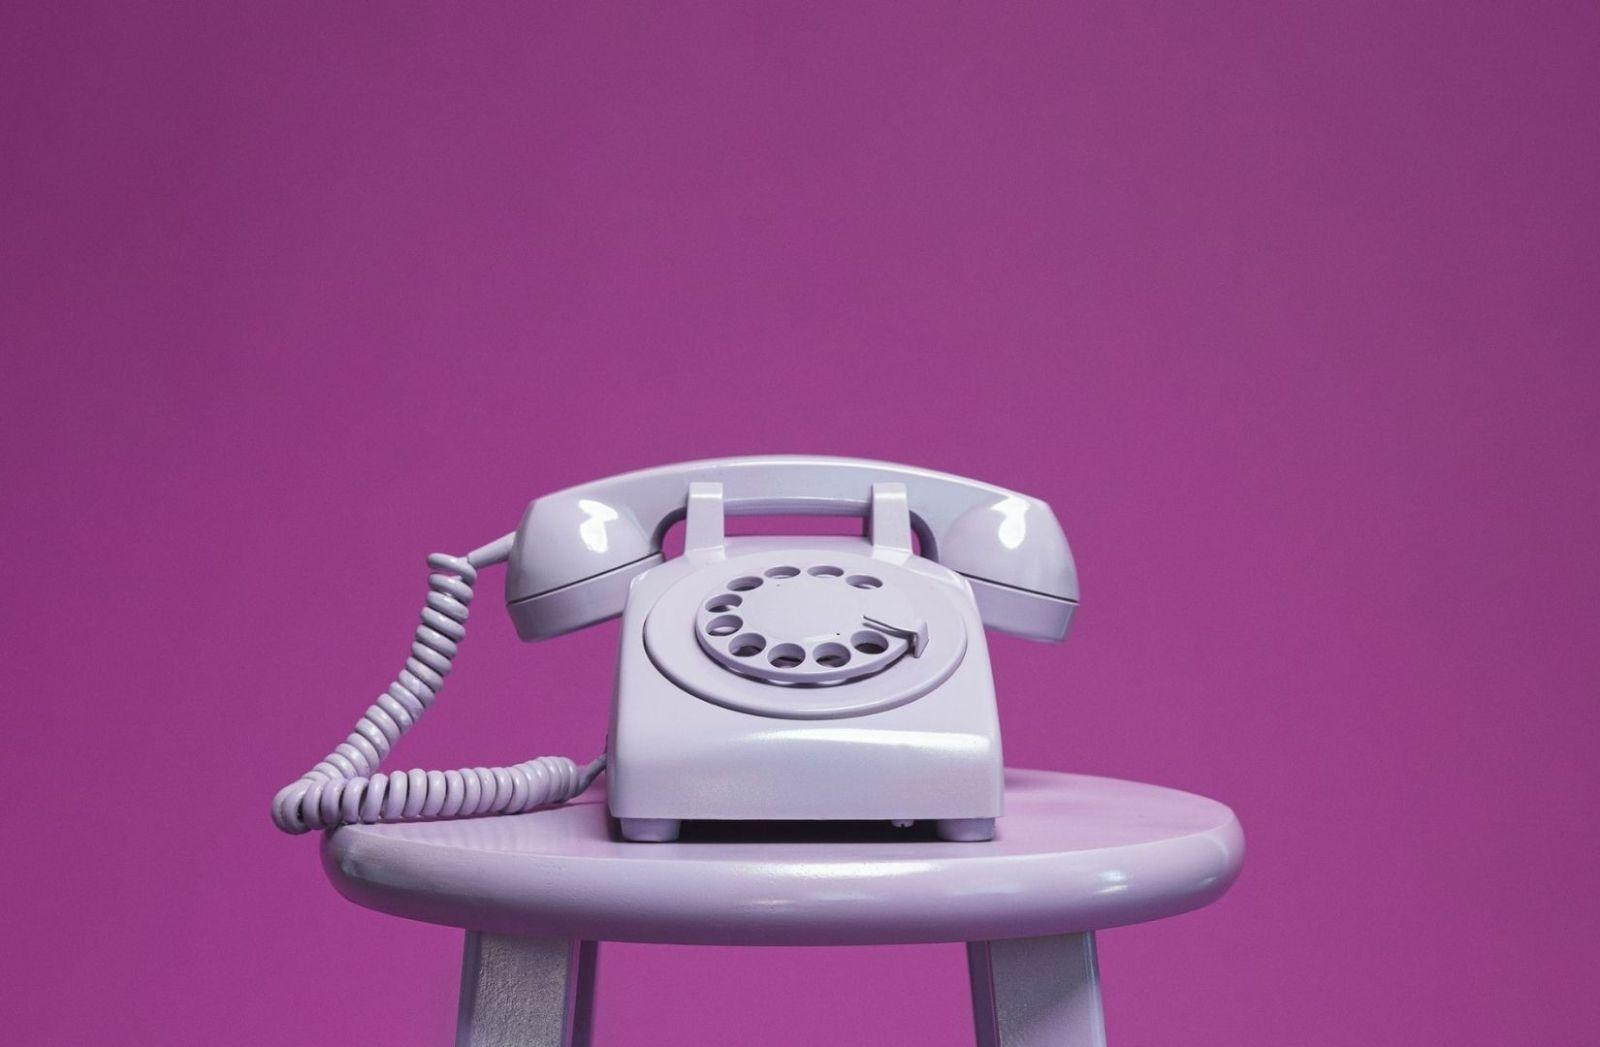 Demografie der Telefontechnik in Kunst vereint. (Foto: Luke Southern, Unsplash.com)